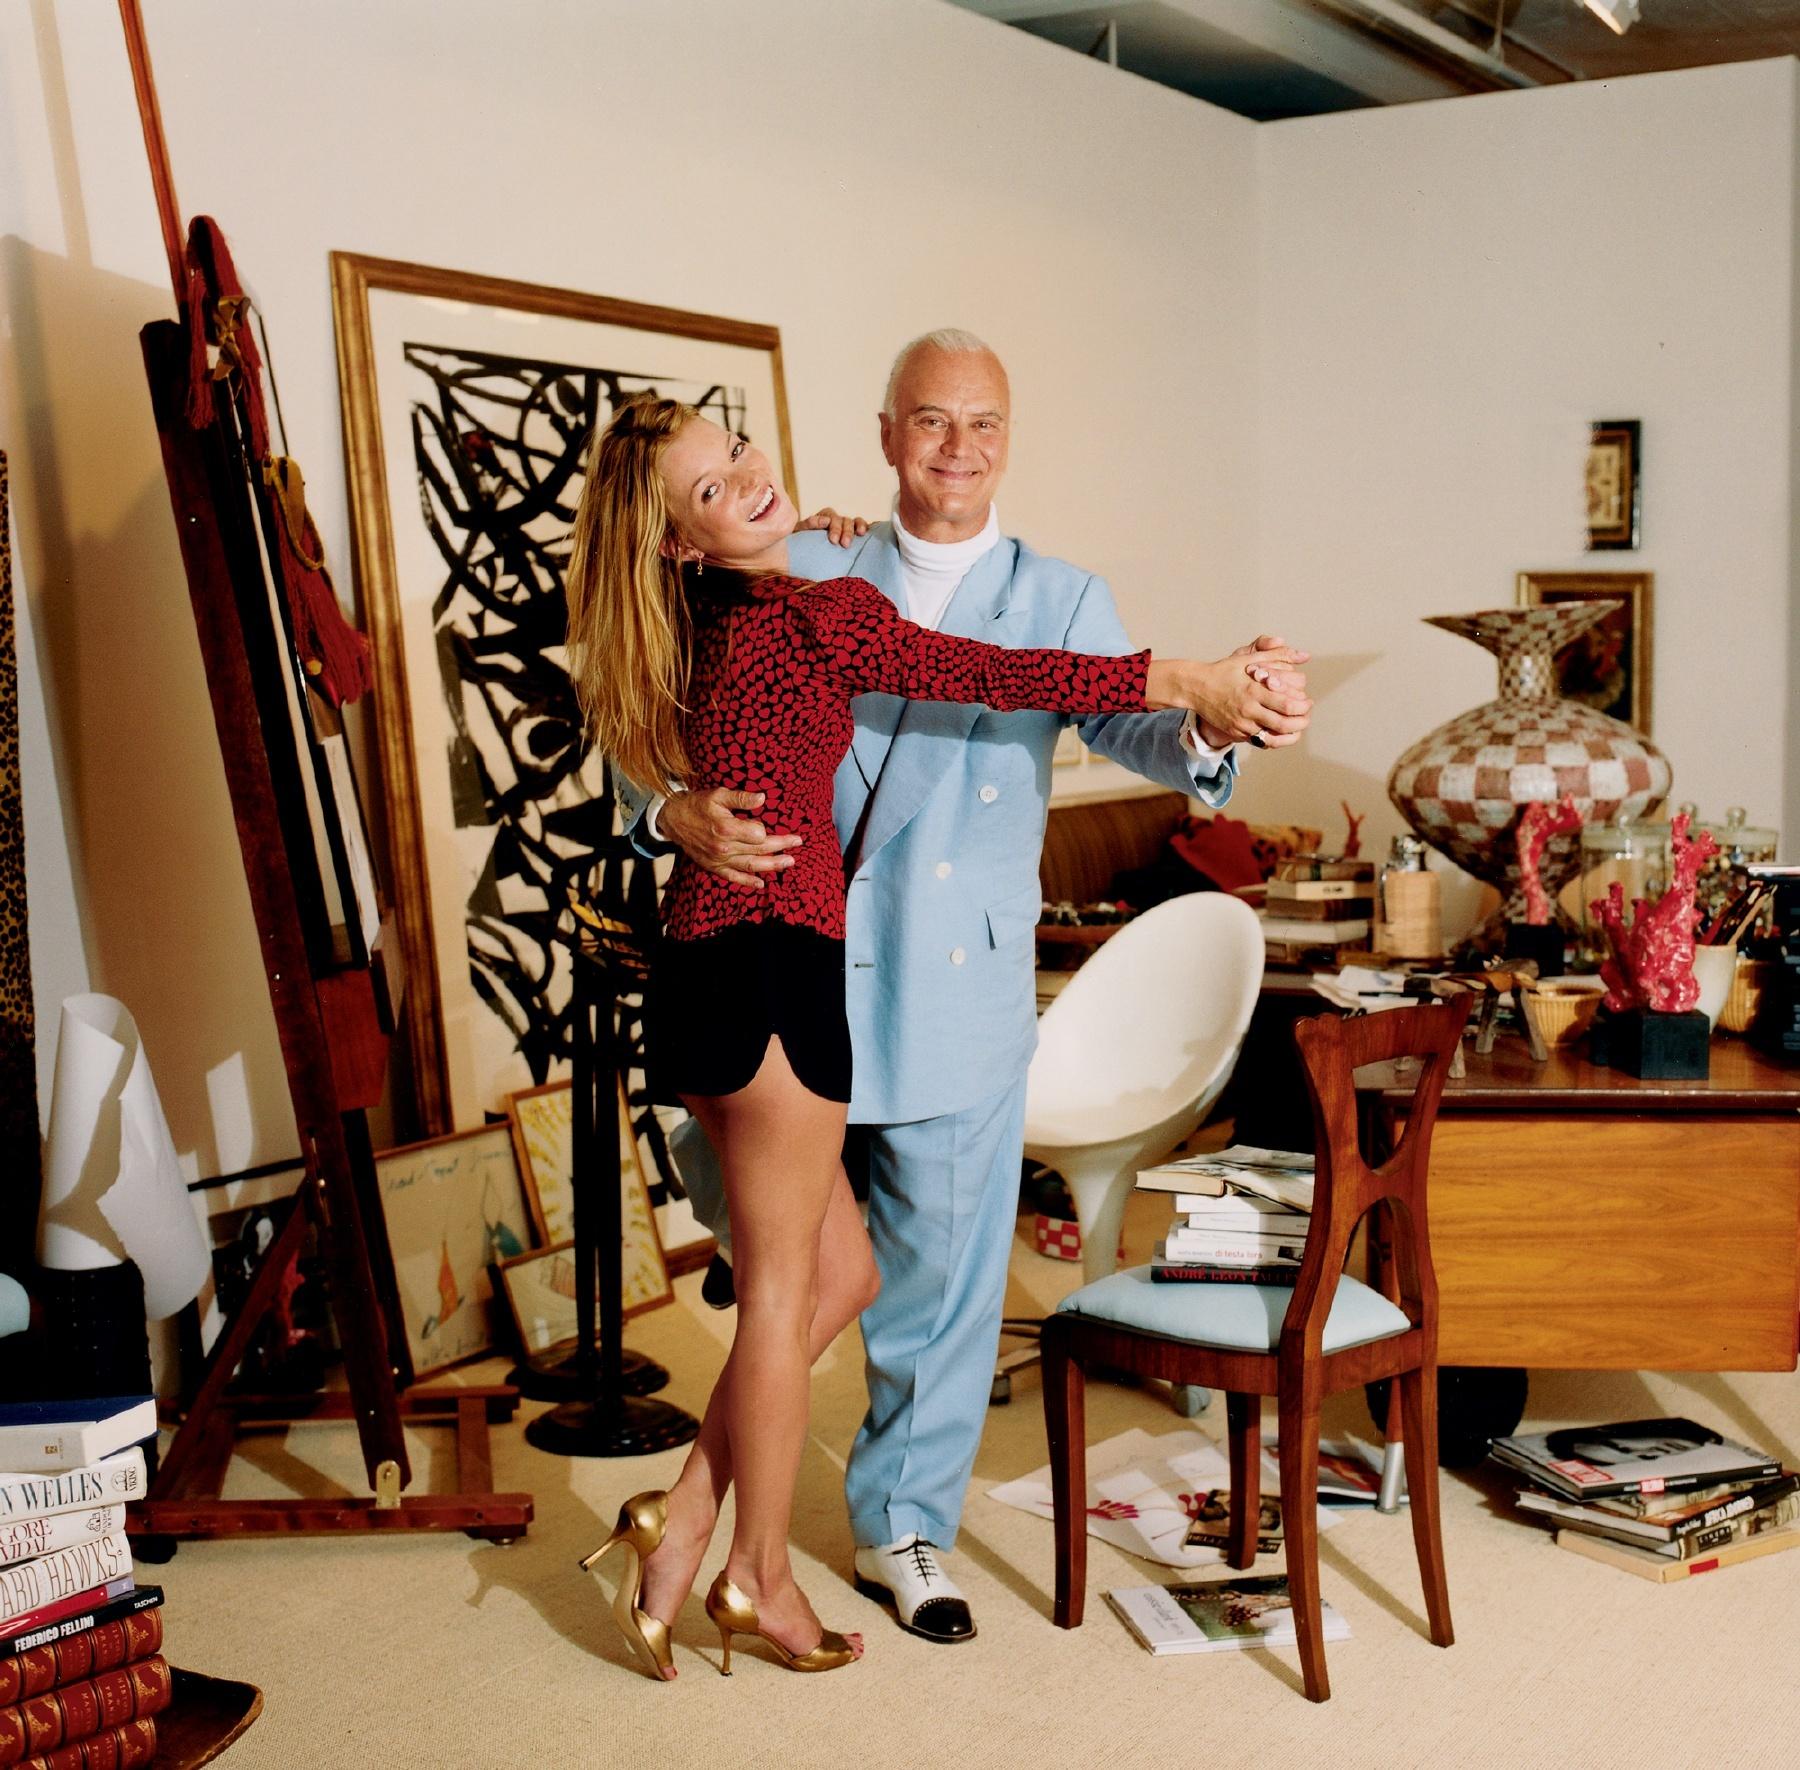 Manolo Blahnik. L'art de la chaussure